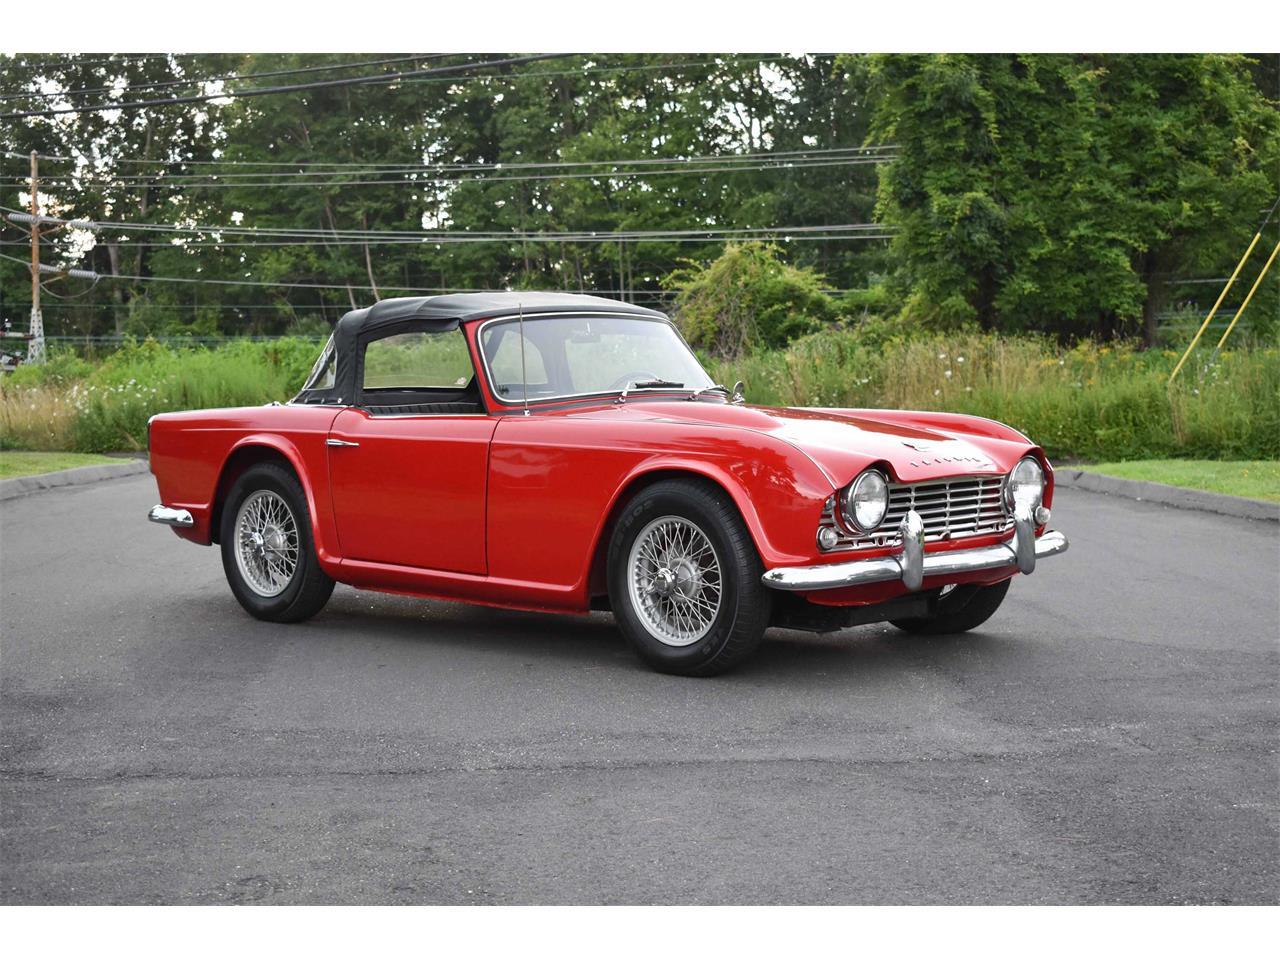 For Sale: 1962 Triumph TR4 in Orange, Connecticut